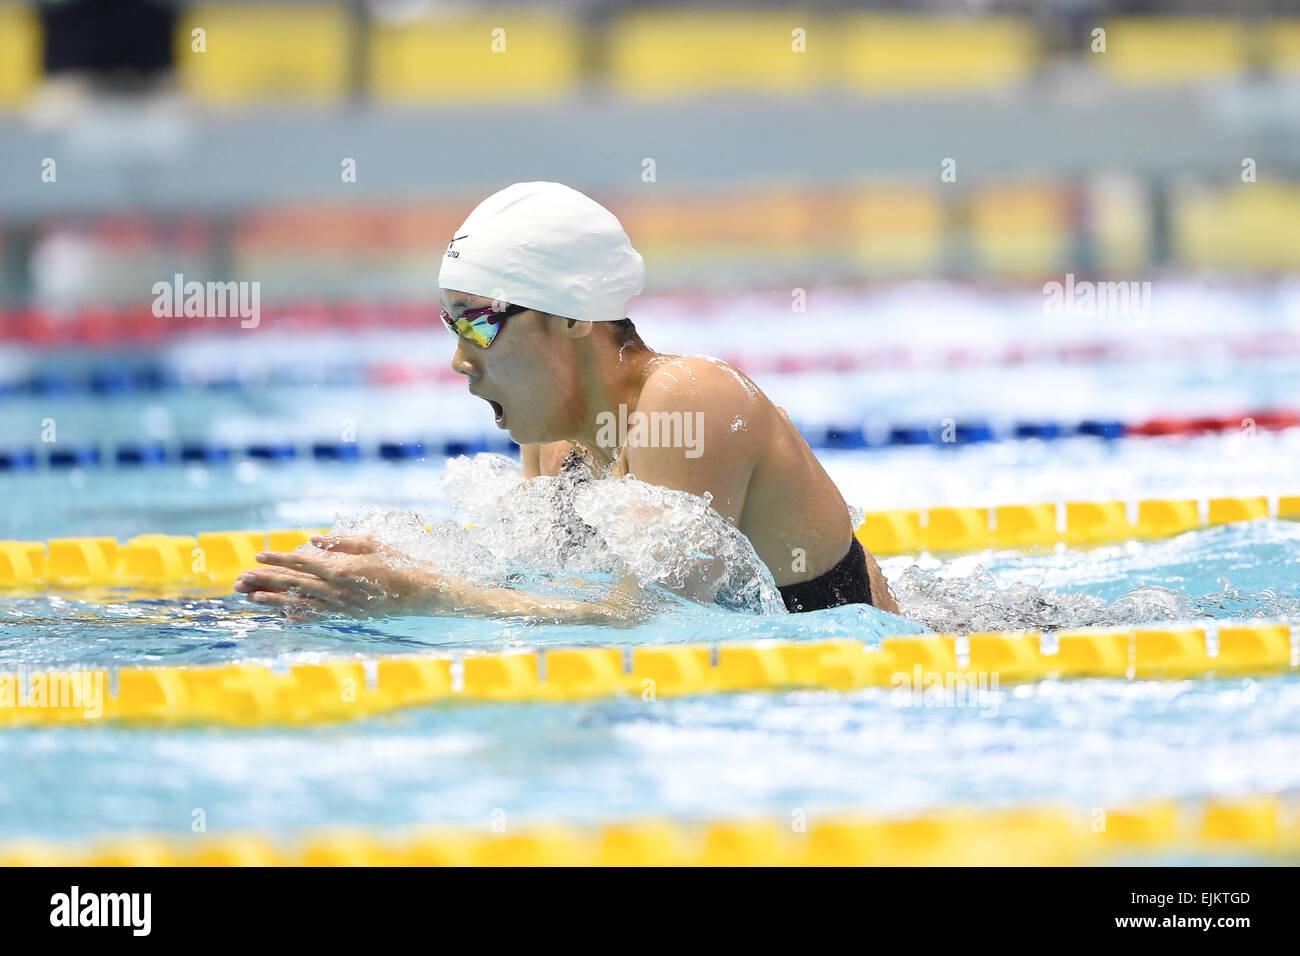 tatsumi international swimming pool tokyo japan 28th mar 2015 suzuka onodera march 28 2015 swimming the 37th joc junior olympic cup womens 400m - Olympic Swimming Pool 2015